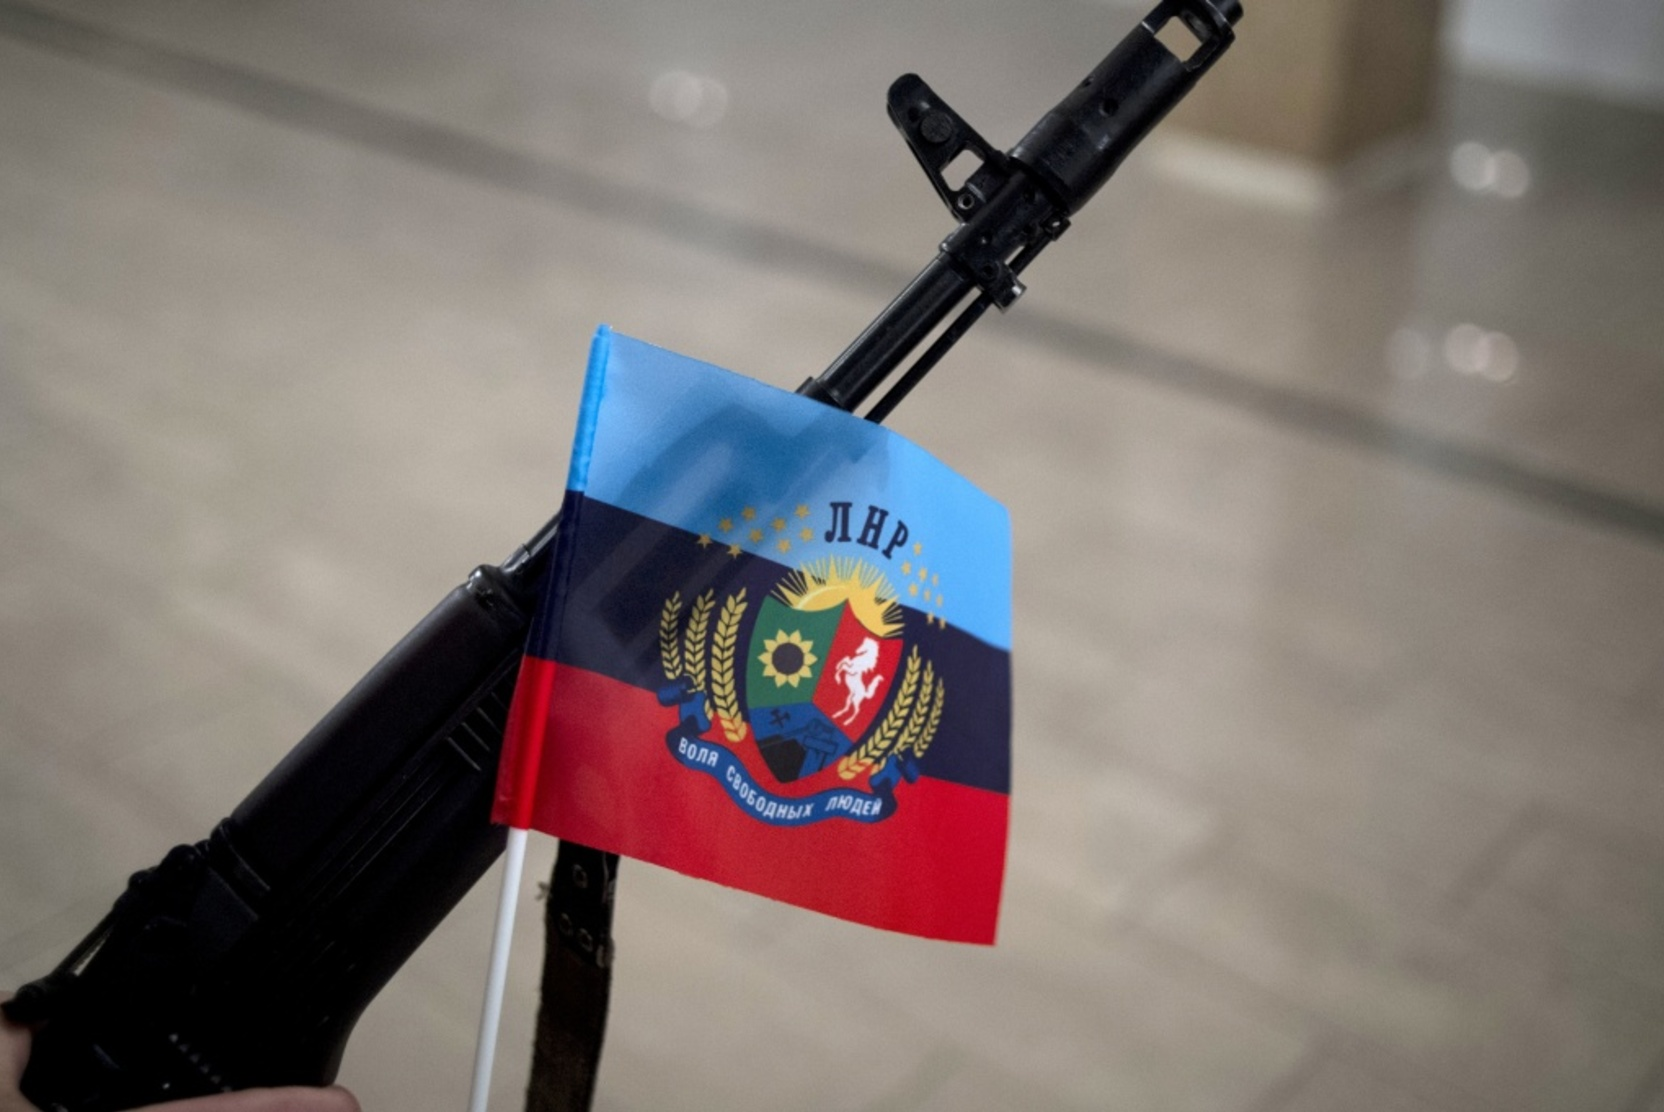 В ЛНР заявили о нападения диверсантов на пост милиции и гибели пяти ополченцев